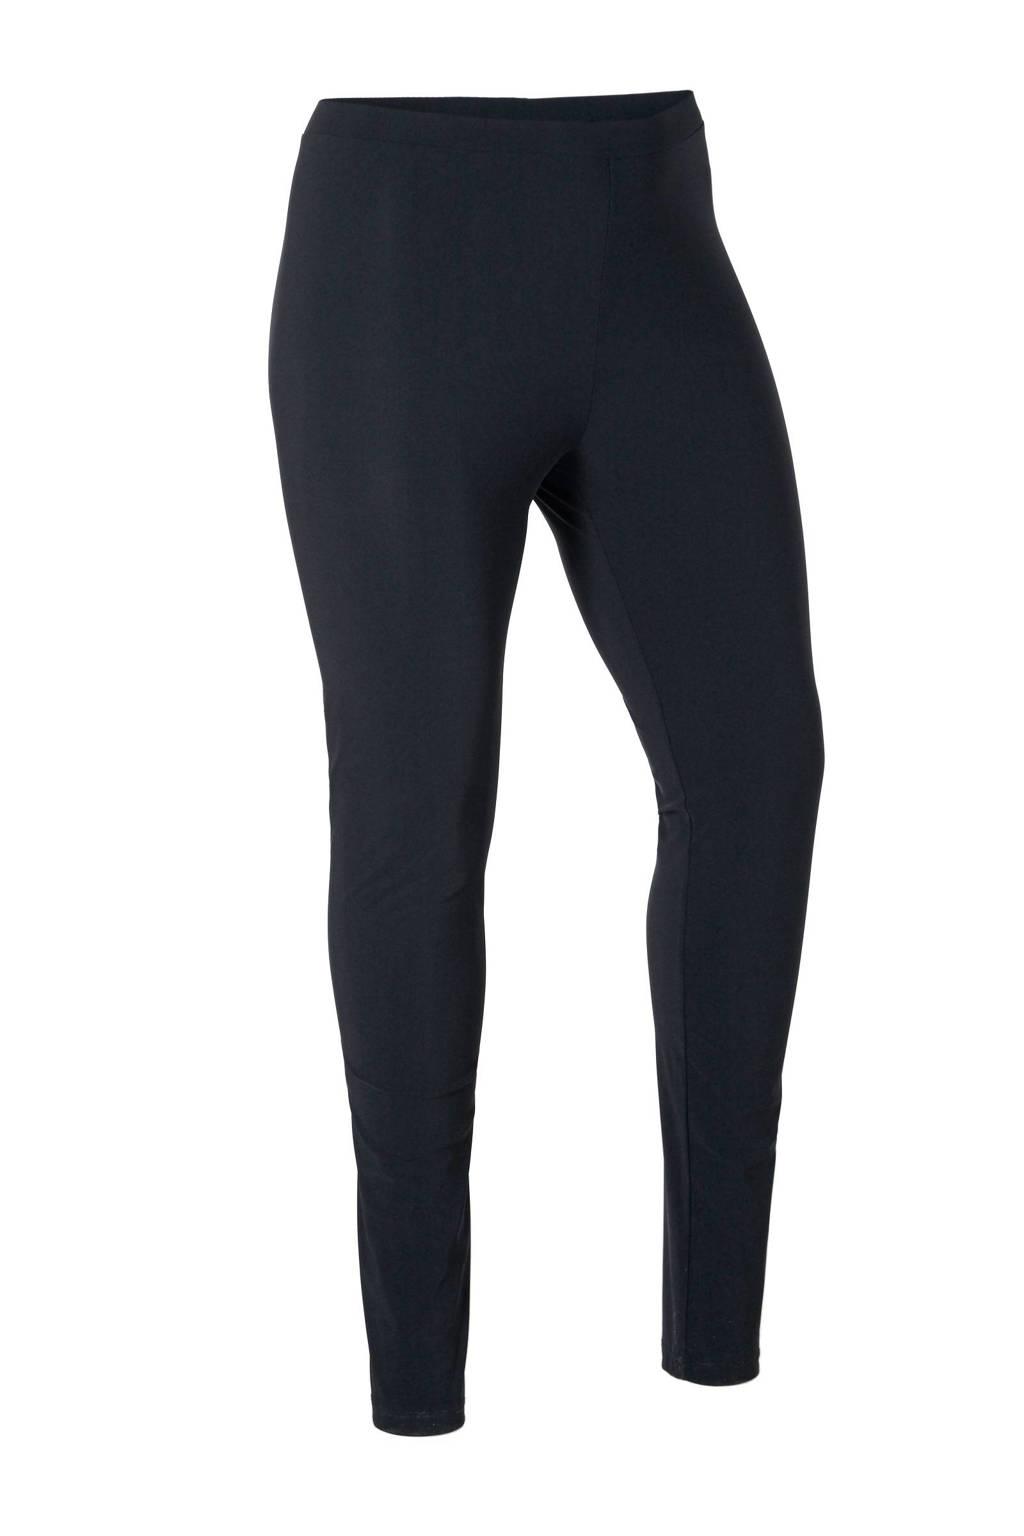 Plus Basics legging van travelstof zwart, Zwart